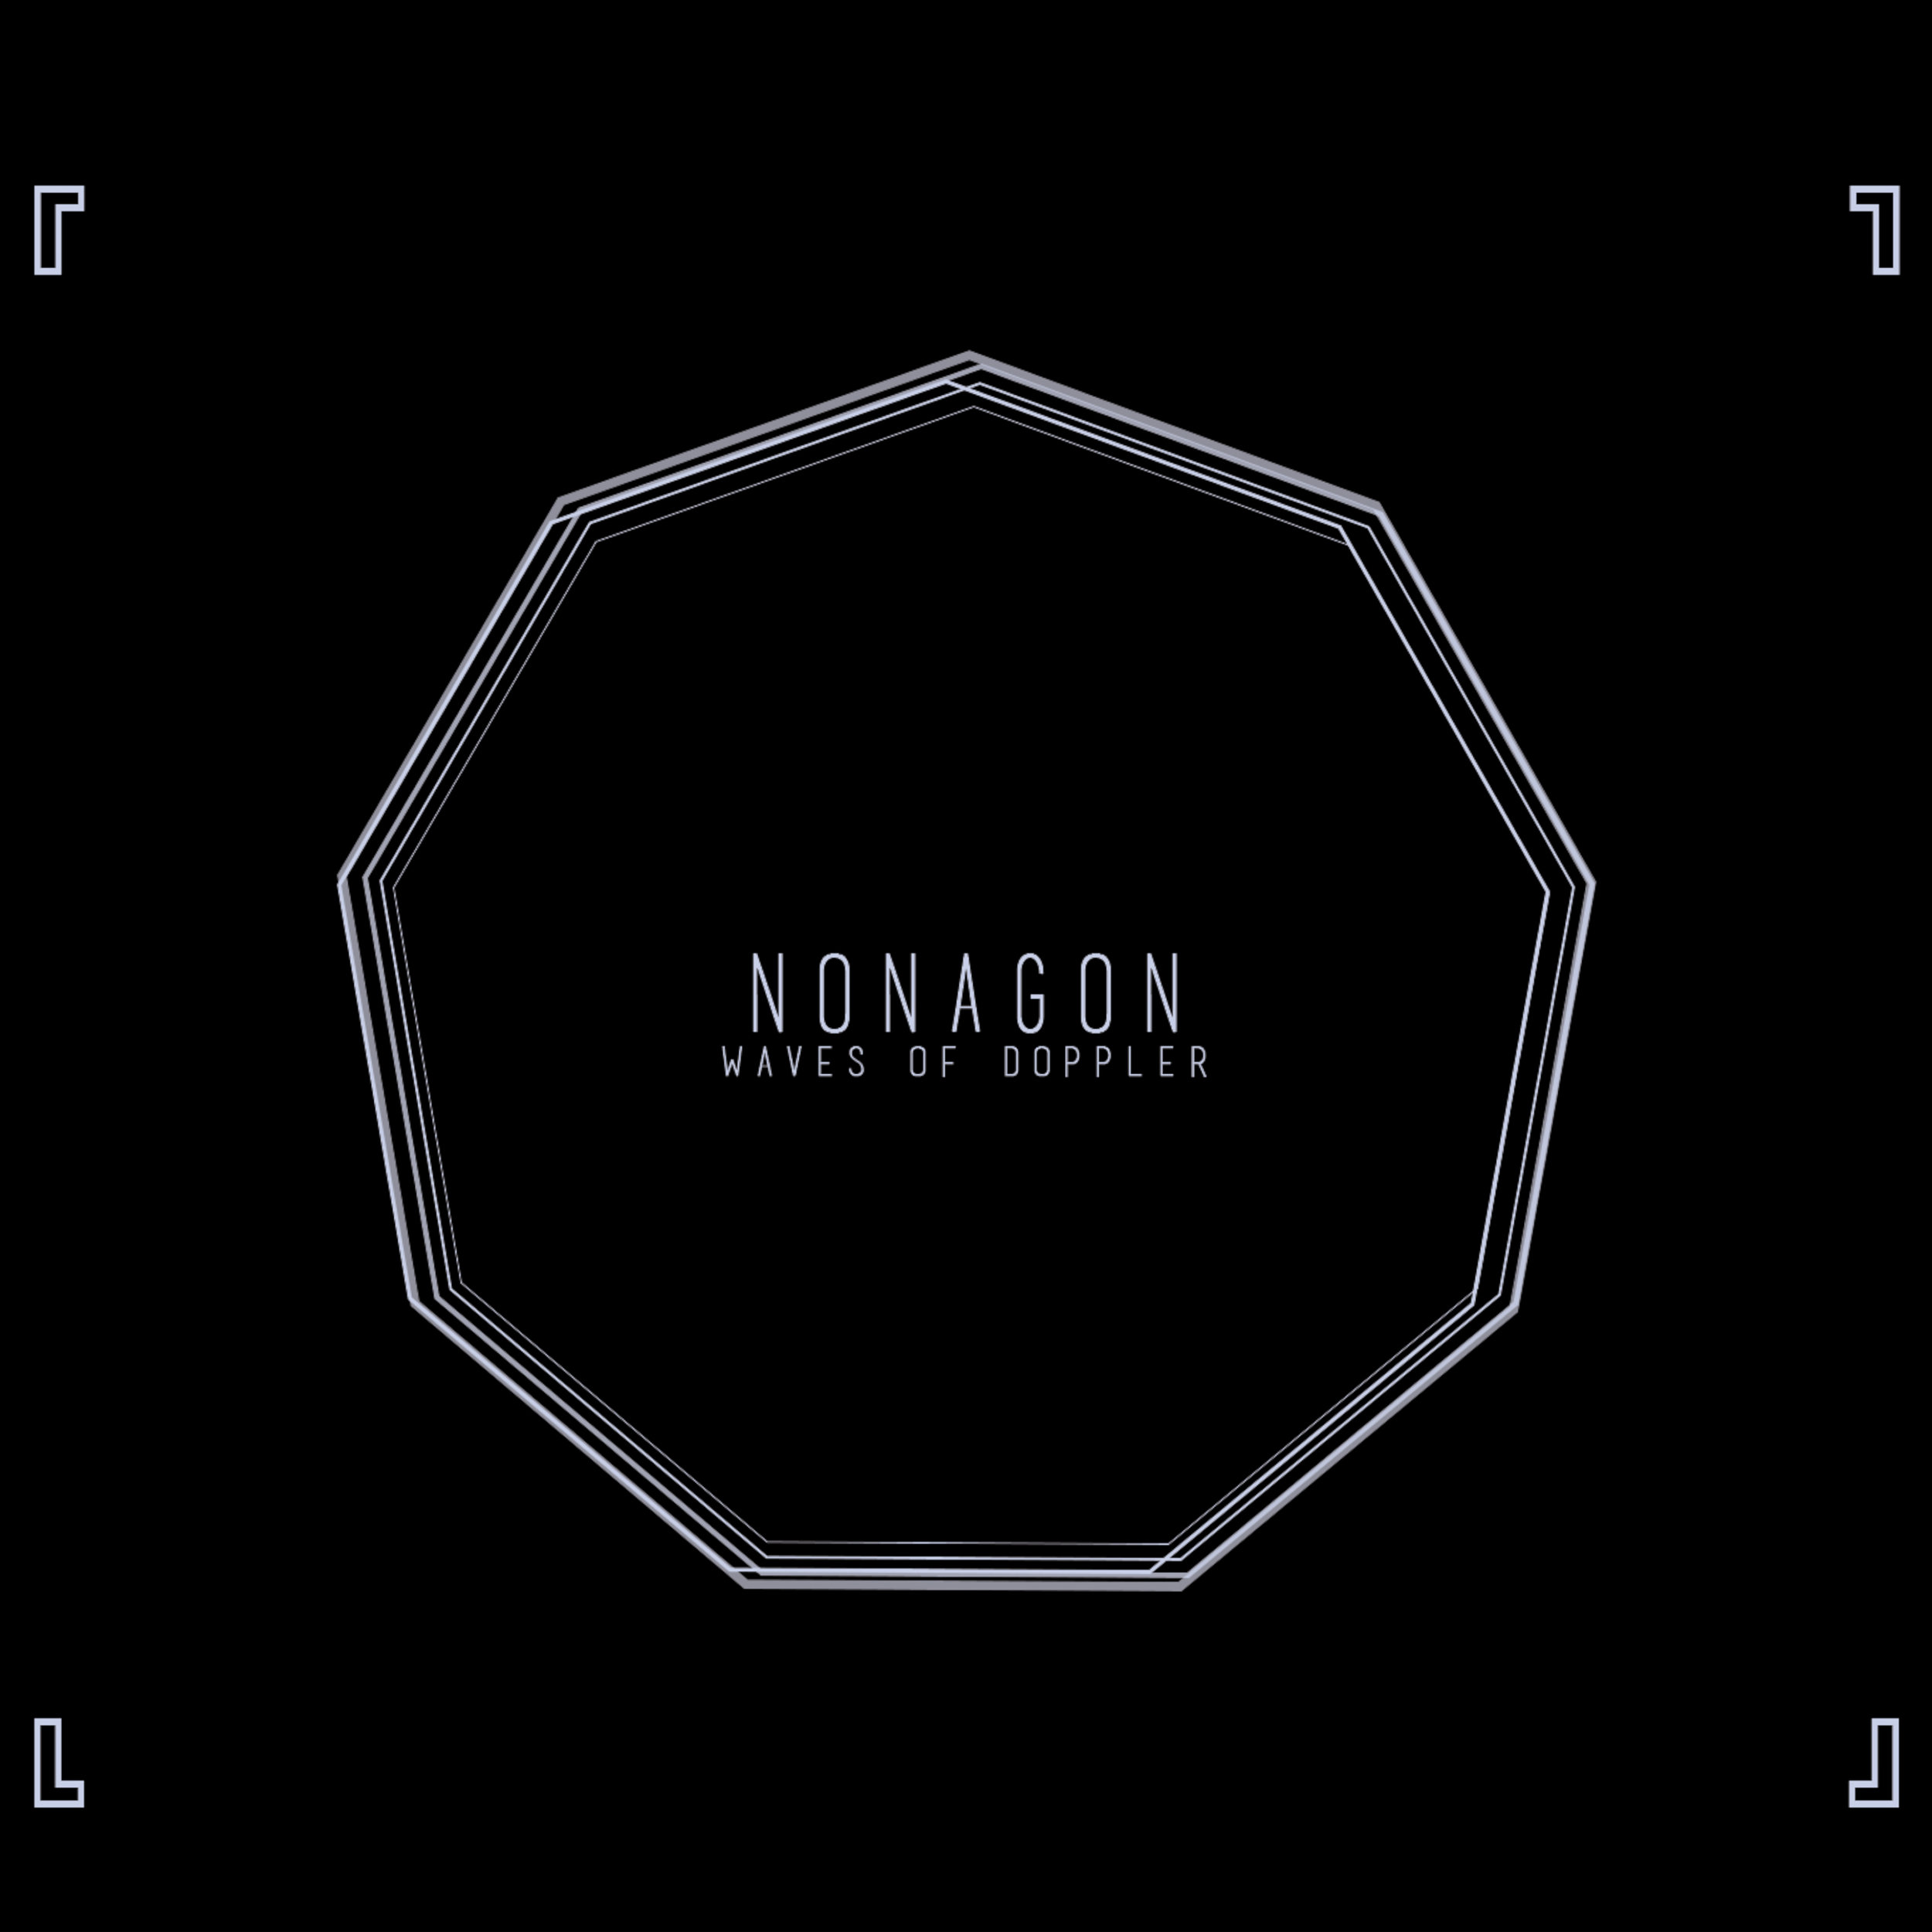 都普勒浪潮 - NONAGON